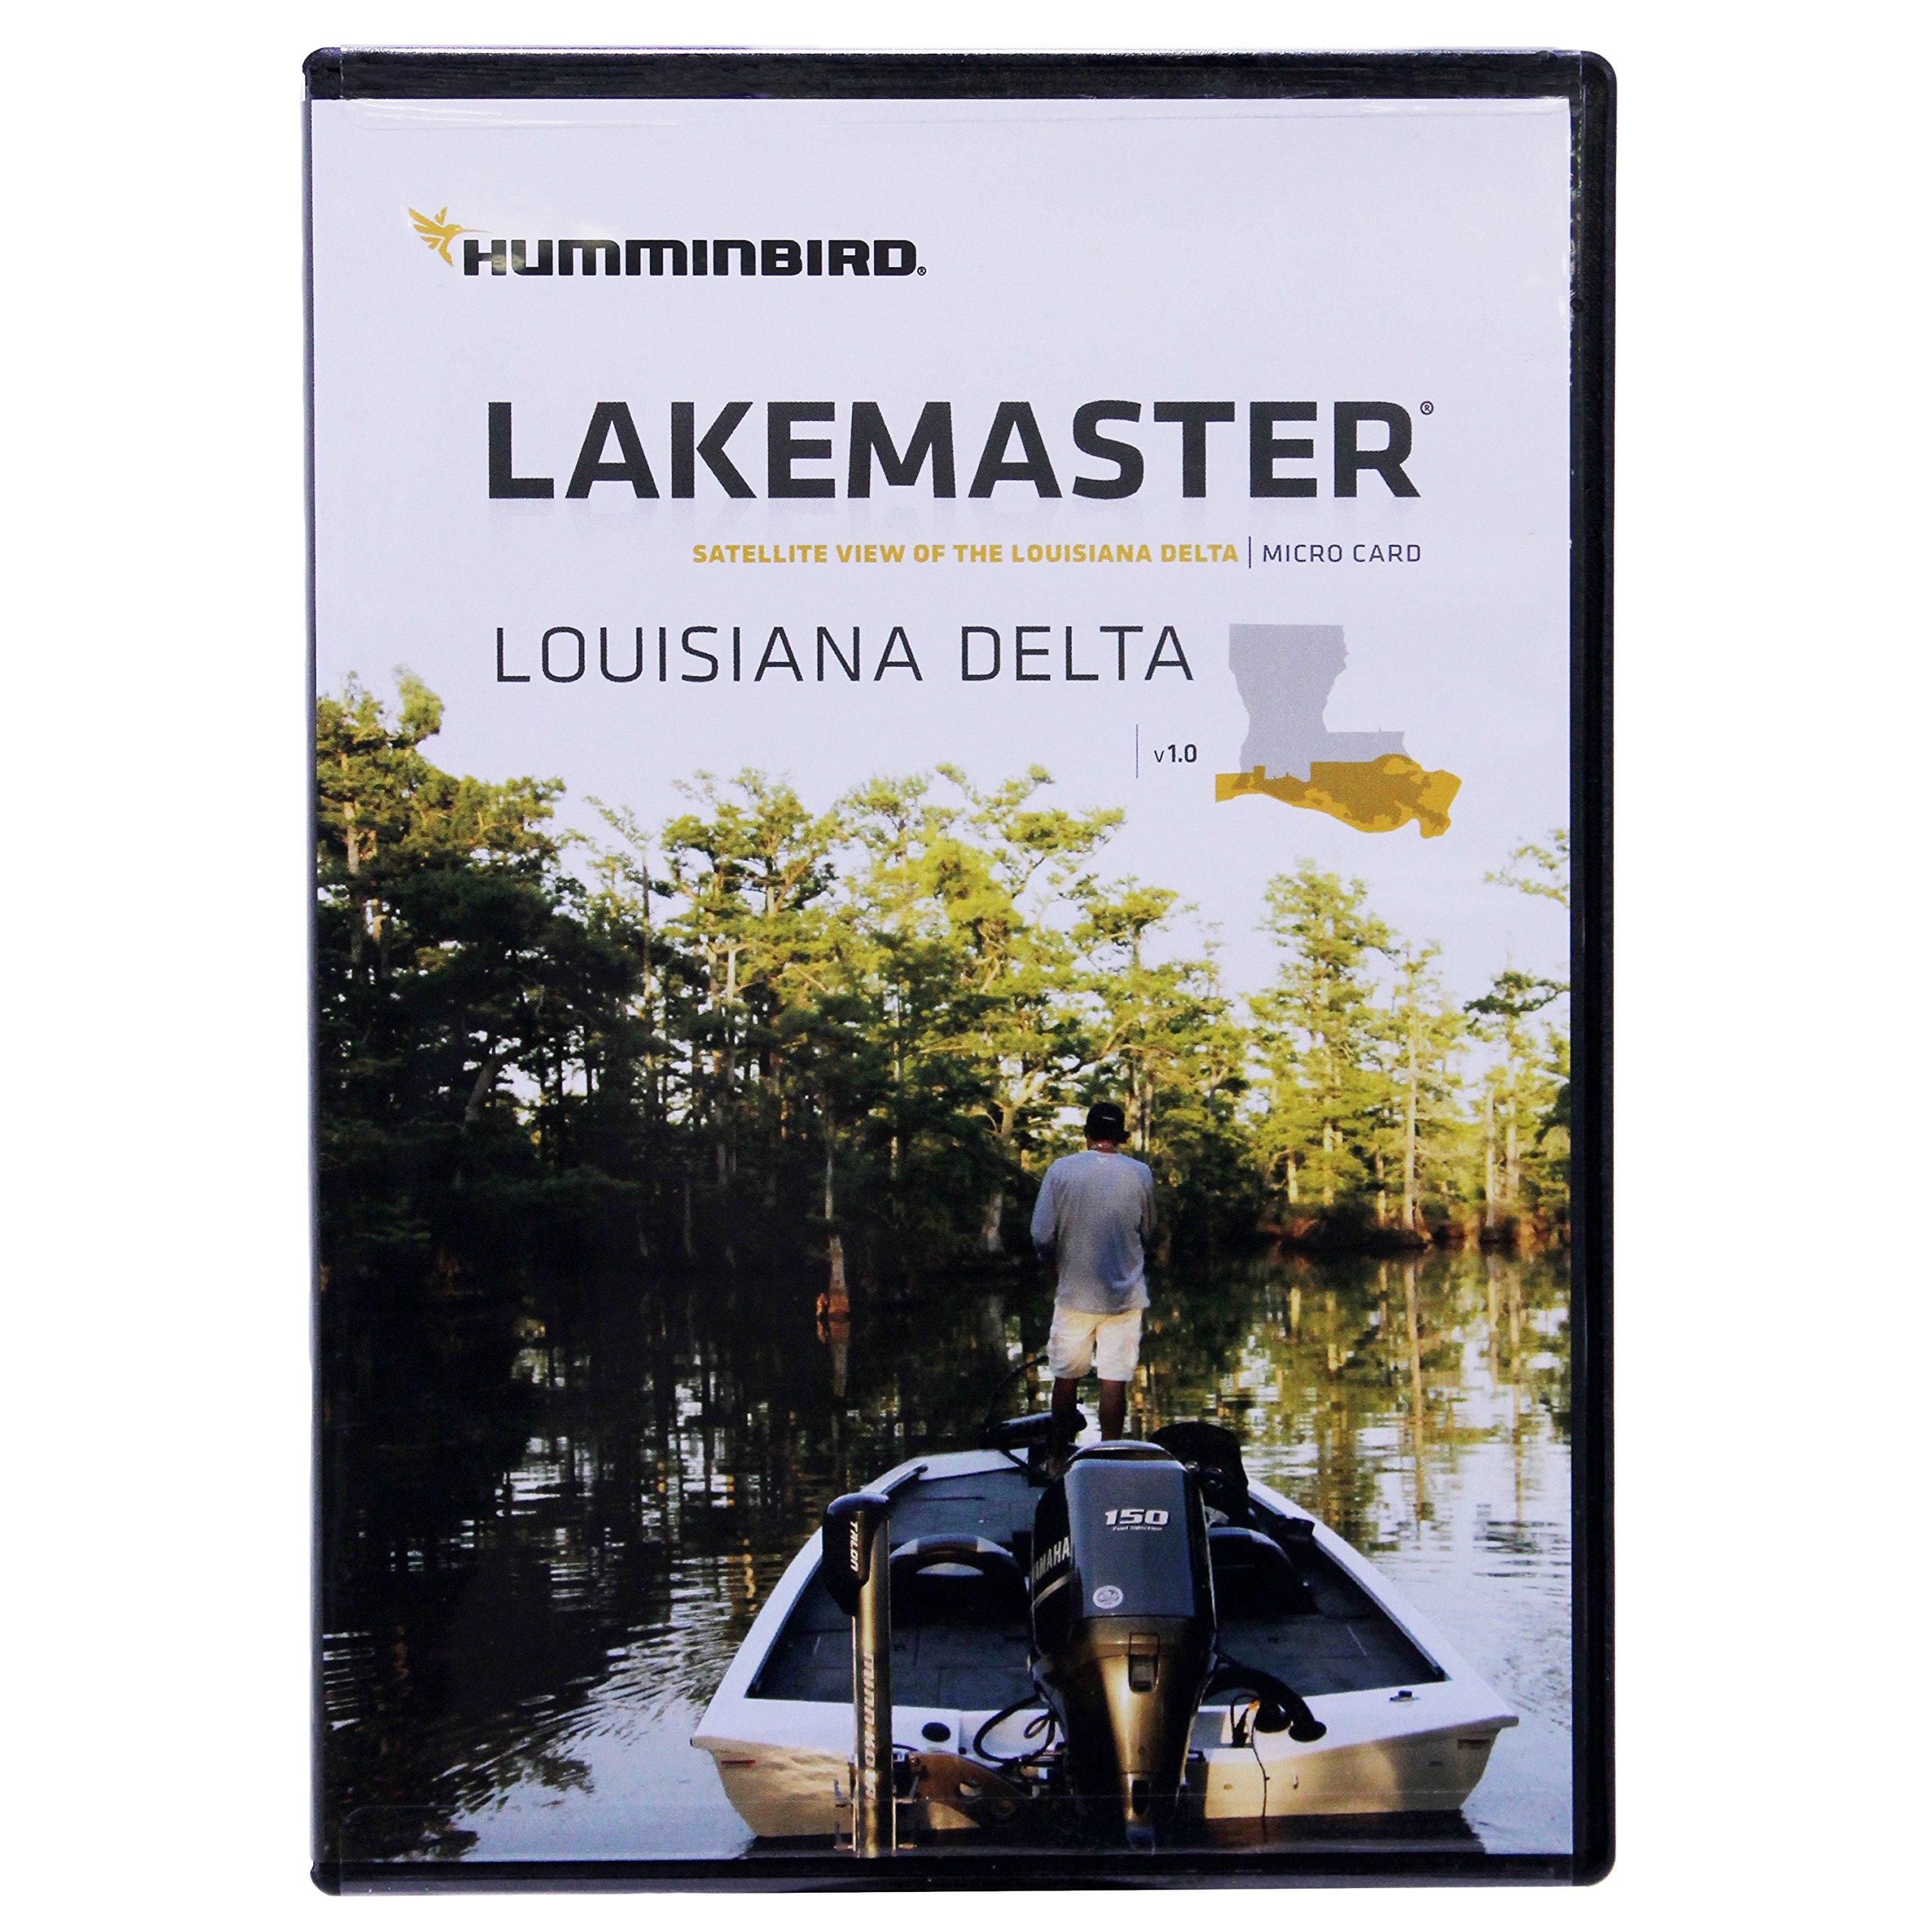 Humminbird LakeMaster Louisiana Delta Aerial View Edition, Micro SD Card, Version 1 by Humminbird